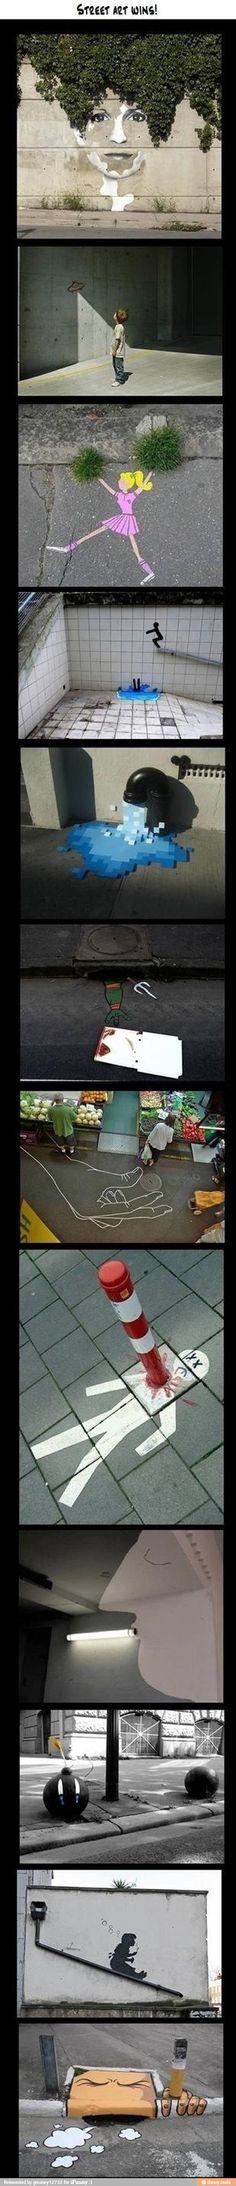 Street art wins